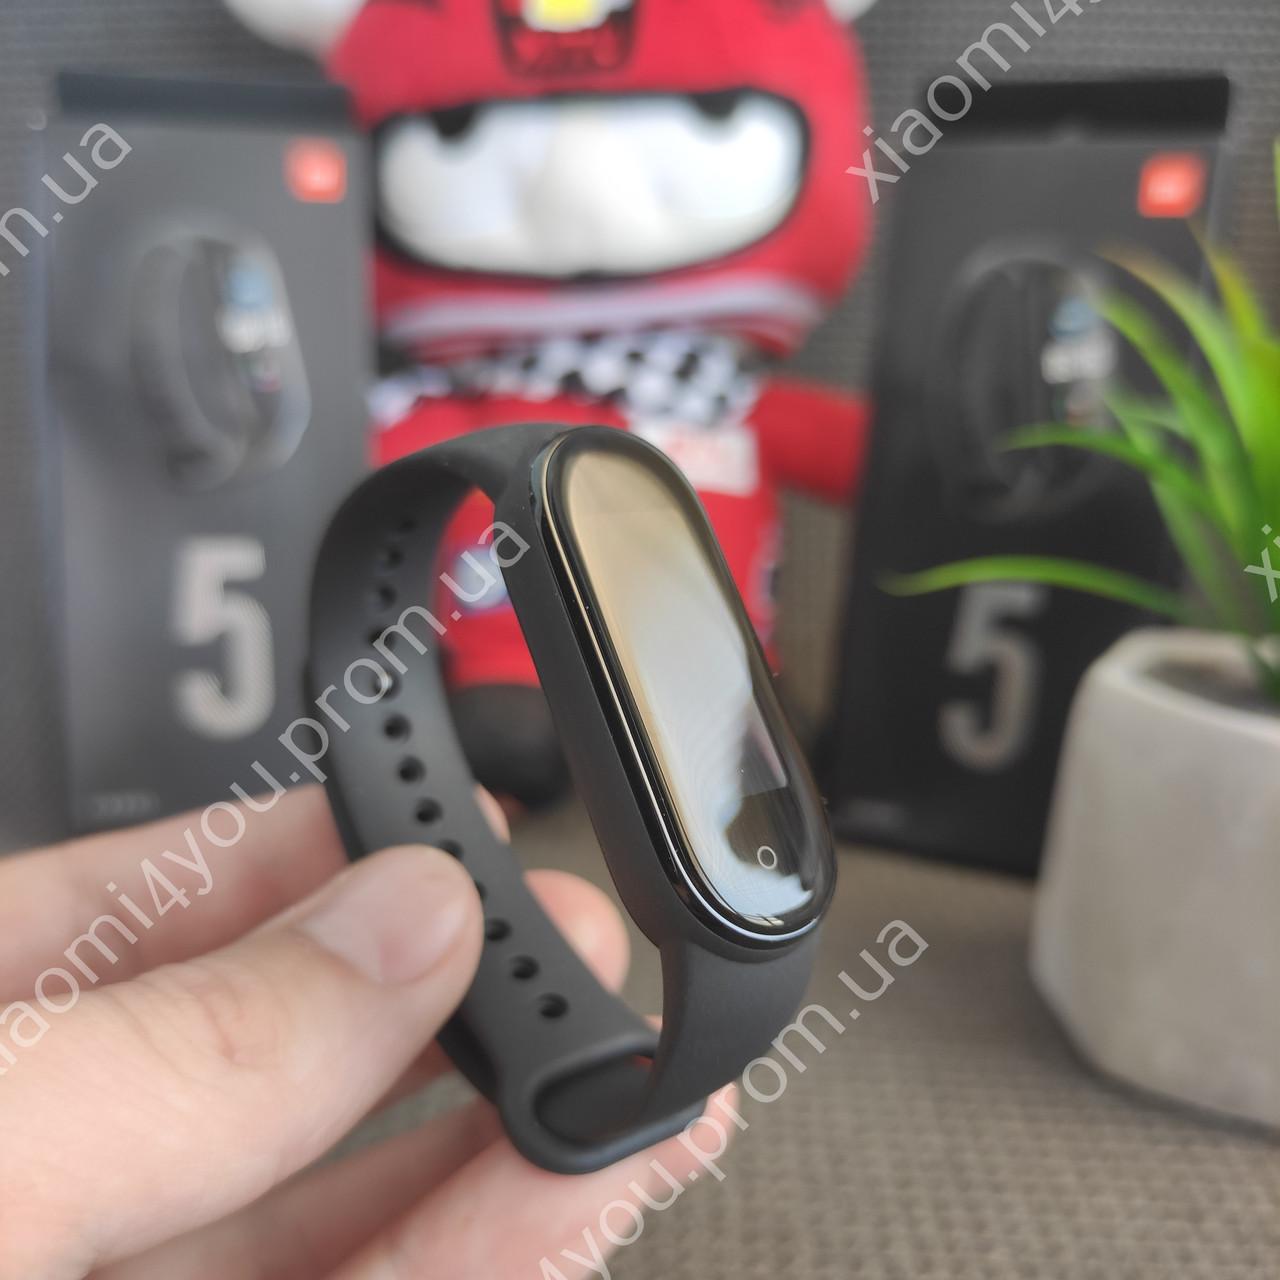 Фитнес браслет Xiaomi Mi Band 5 Original ОРИГИНАЛ Фитнес трекер Часы ксяоми мибенд 5